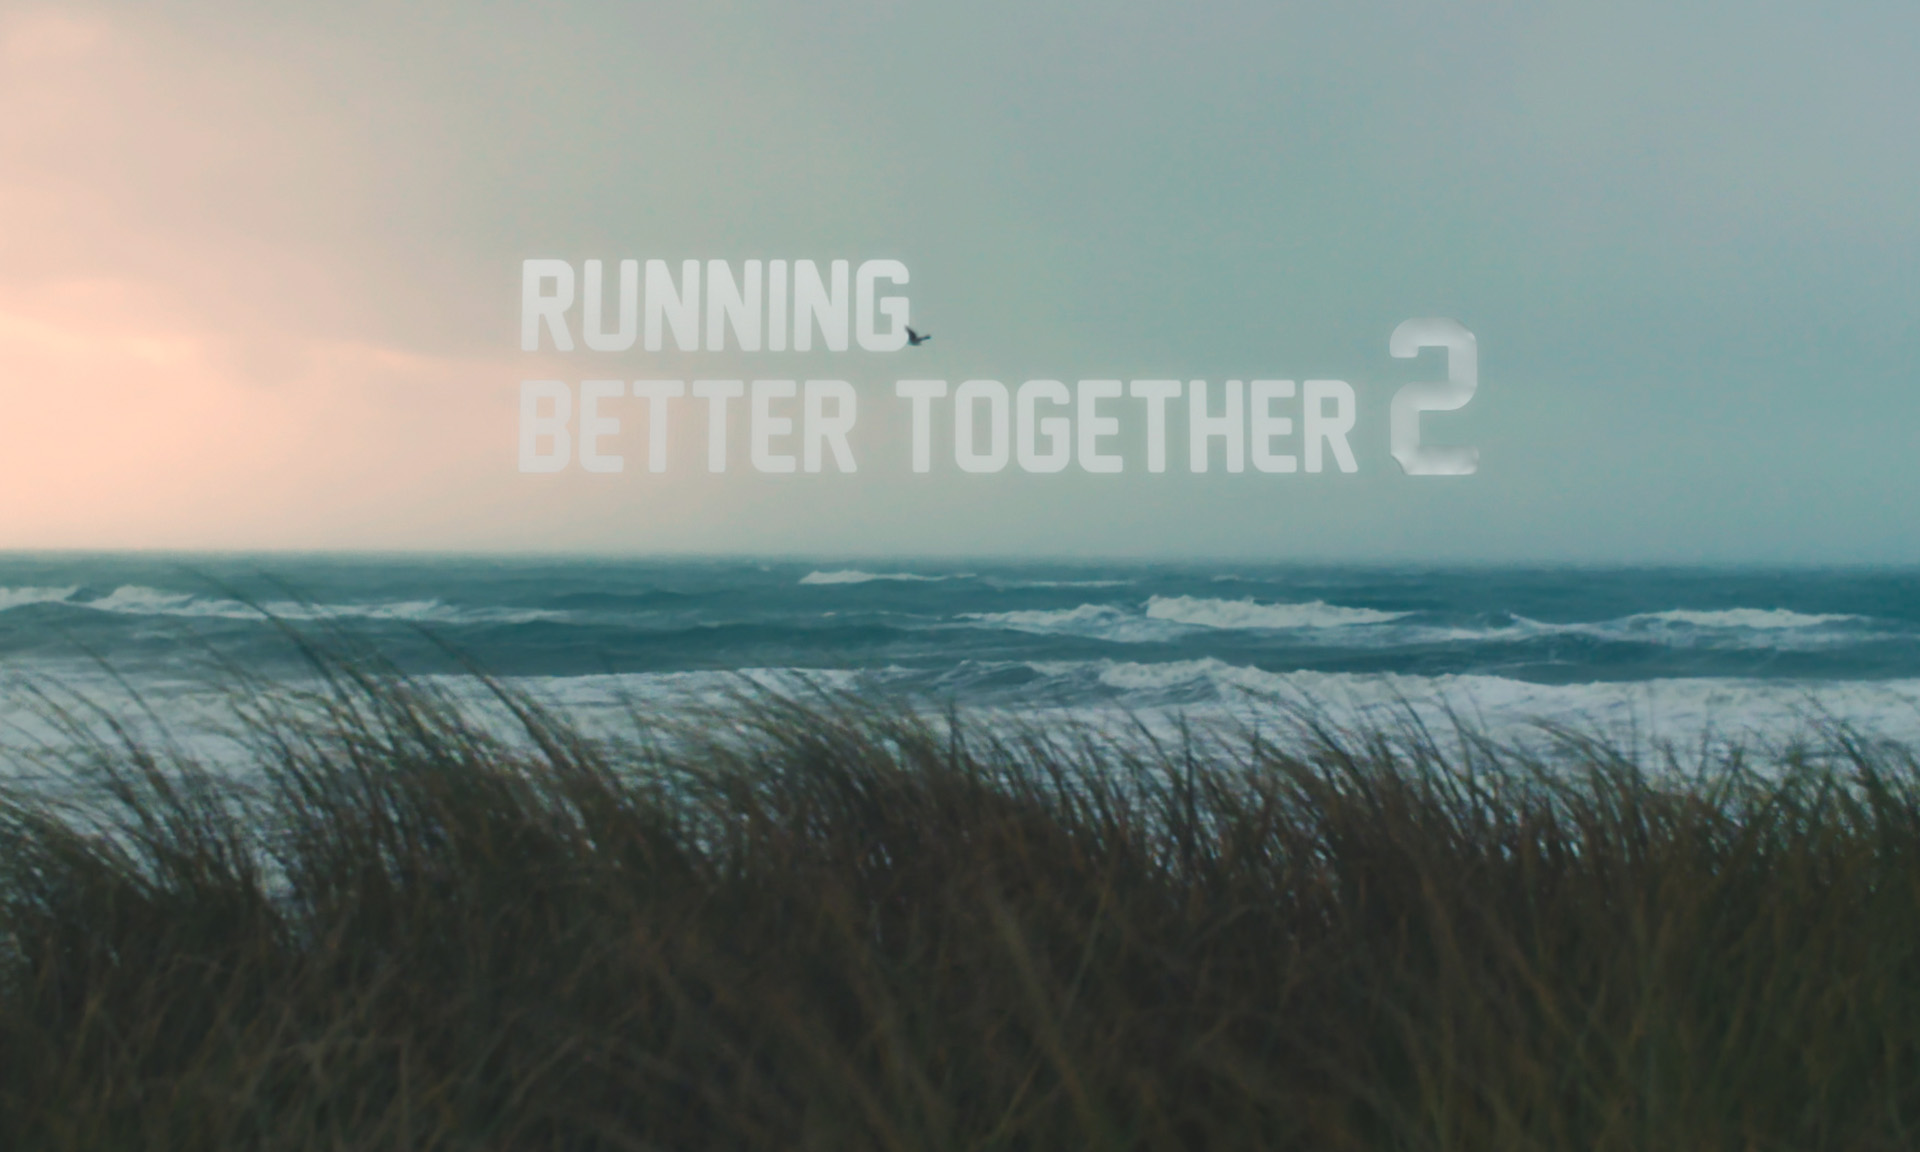 RUNNING BETTER TOGETHER 2